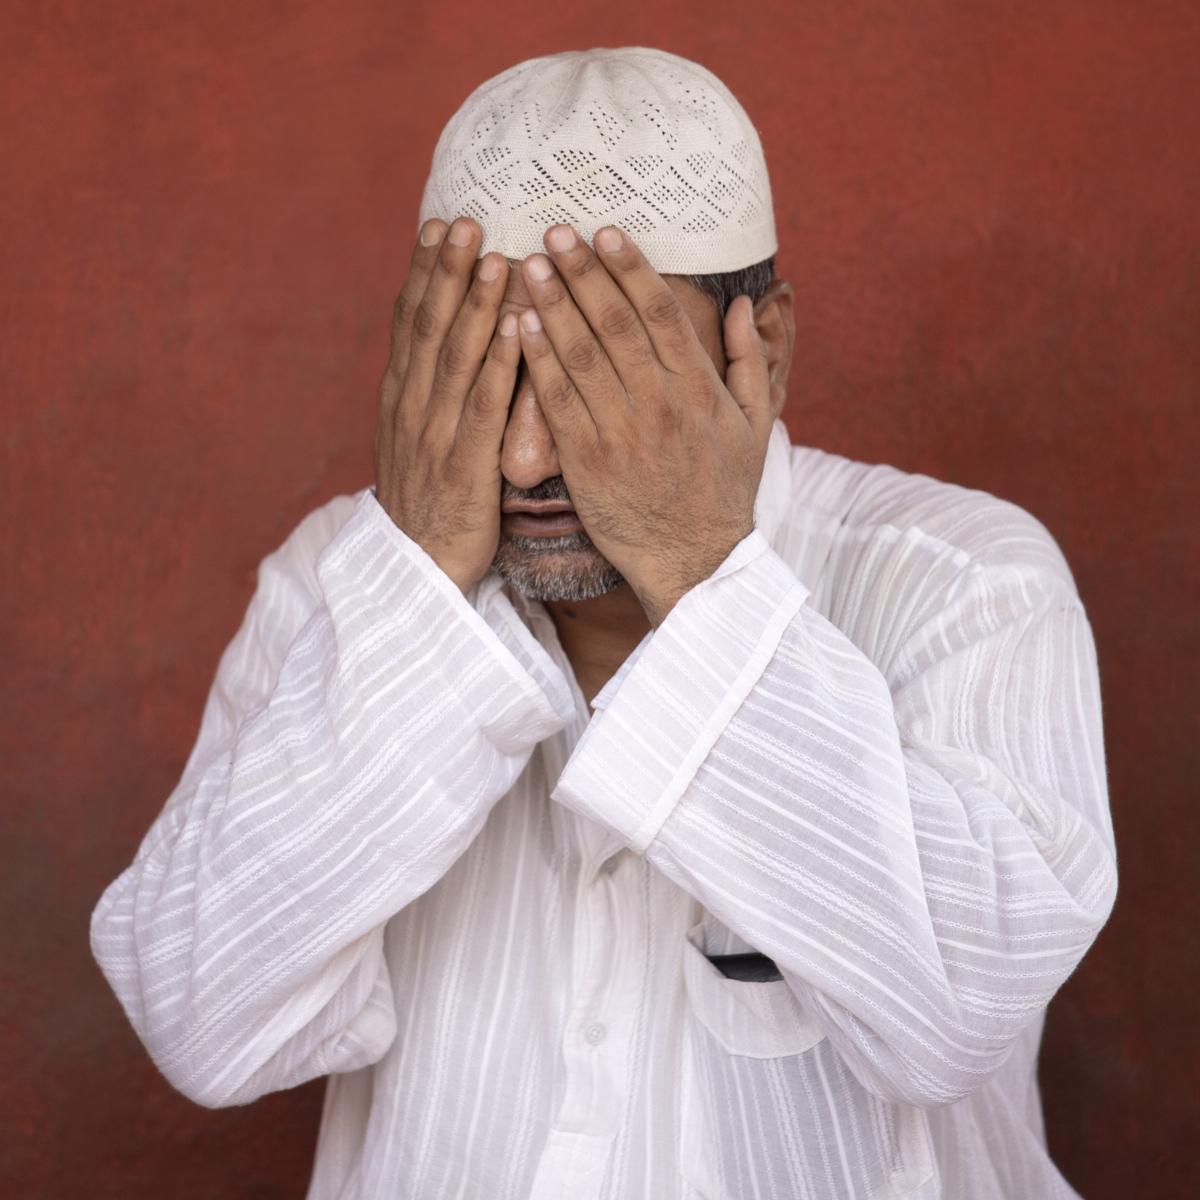 Madhya Pradesh: Muslims observing Ramzan in tough times